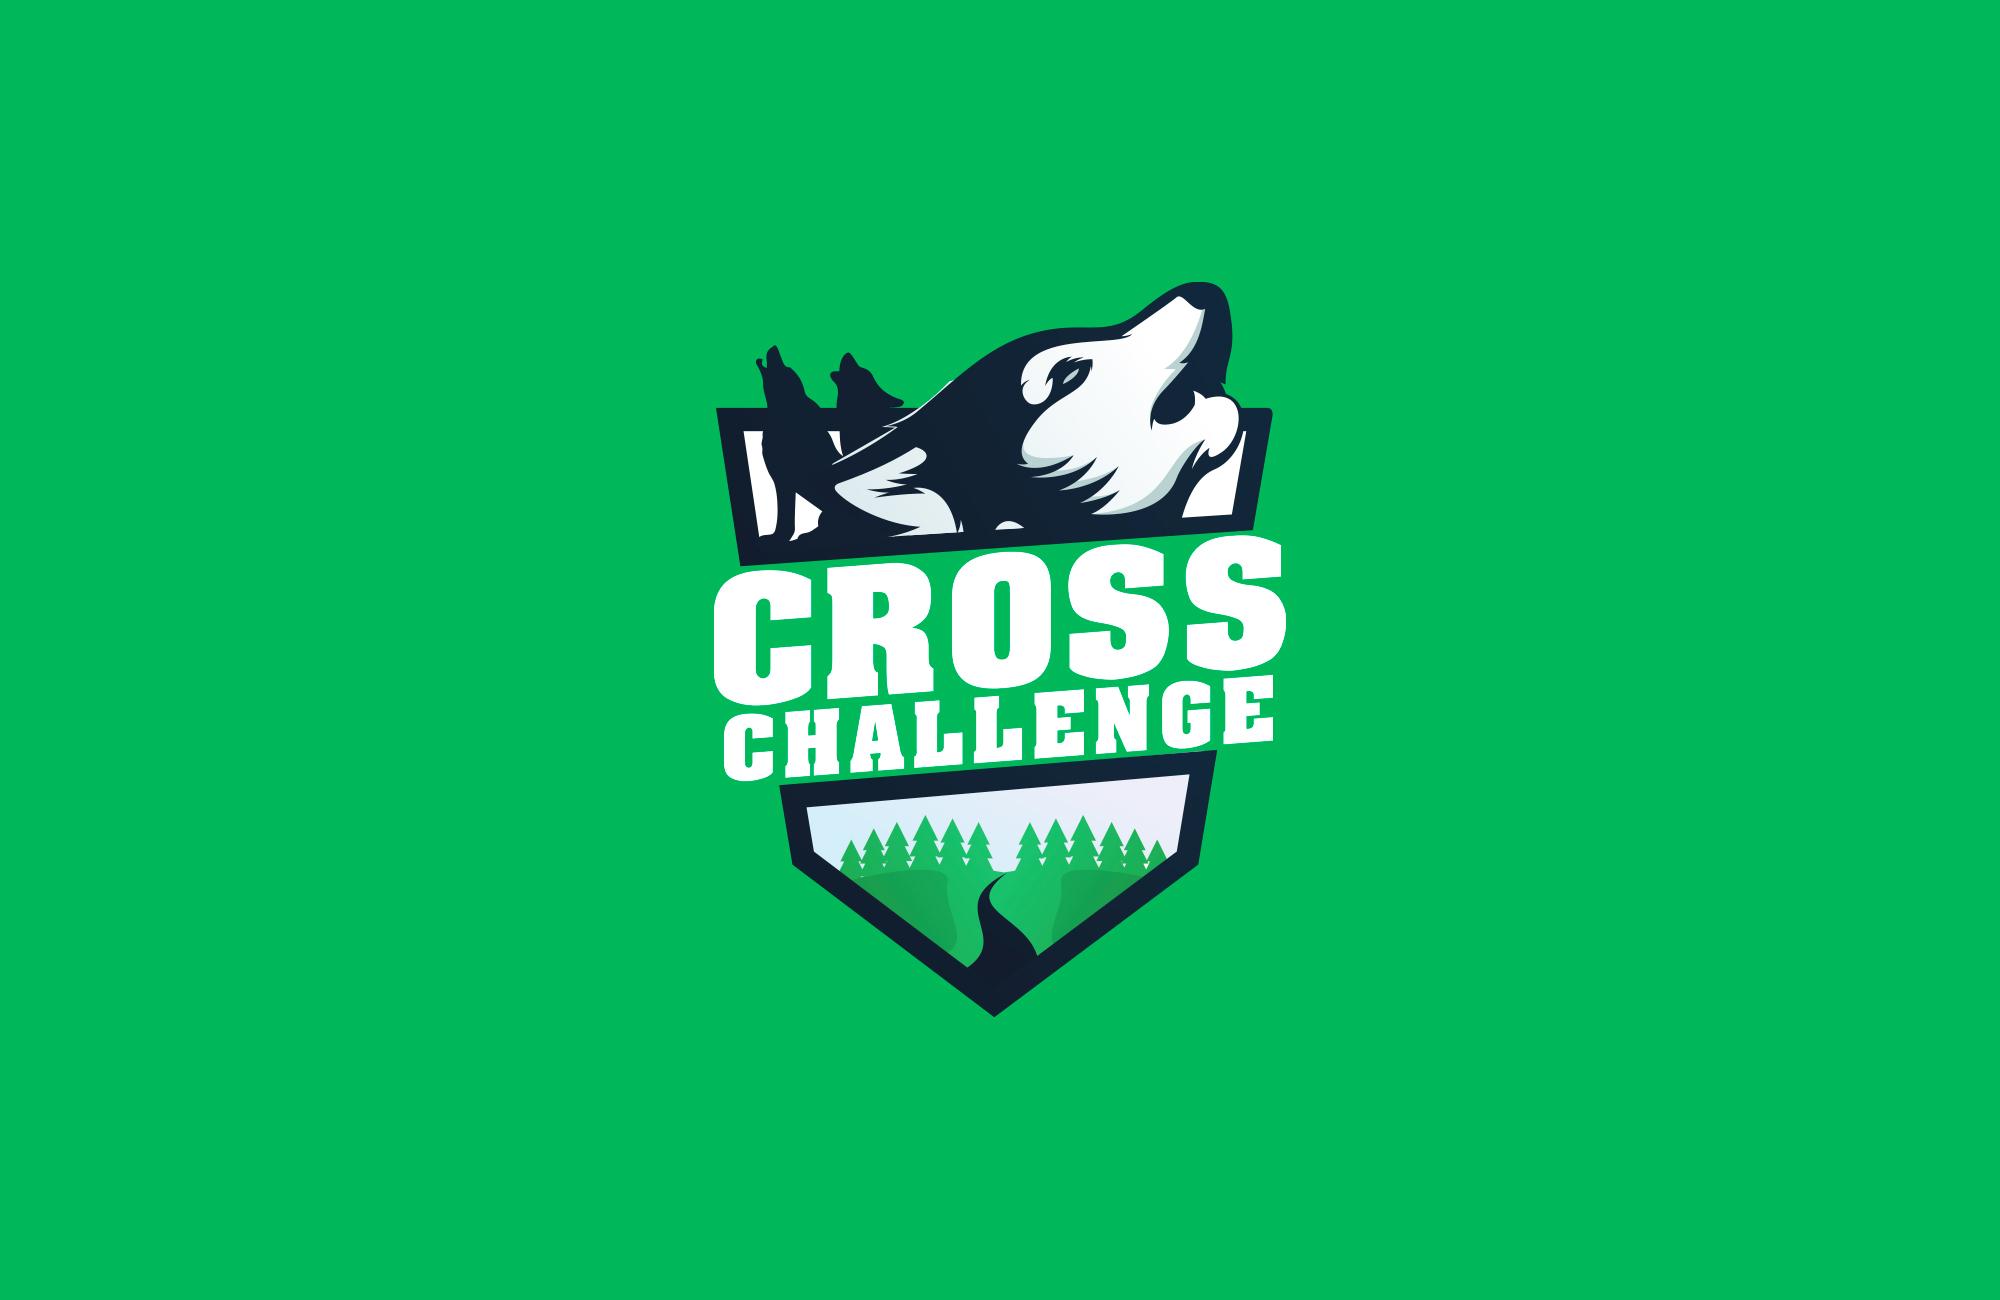 boom-agencia-marketing-digital-branding-carrera-cross-challenge-logo